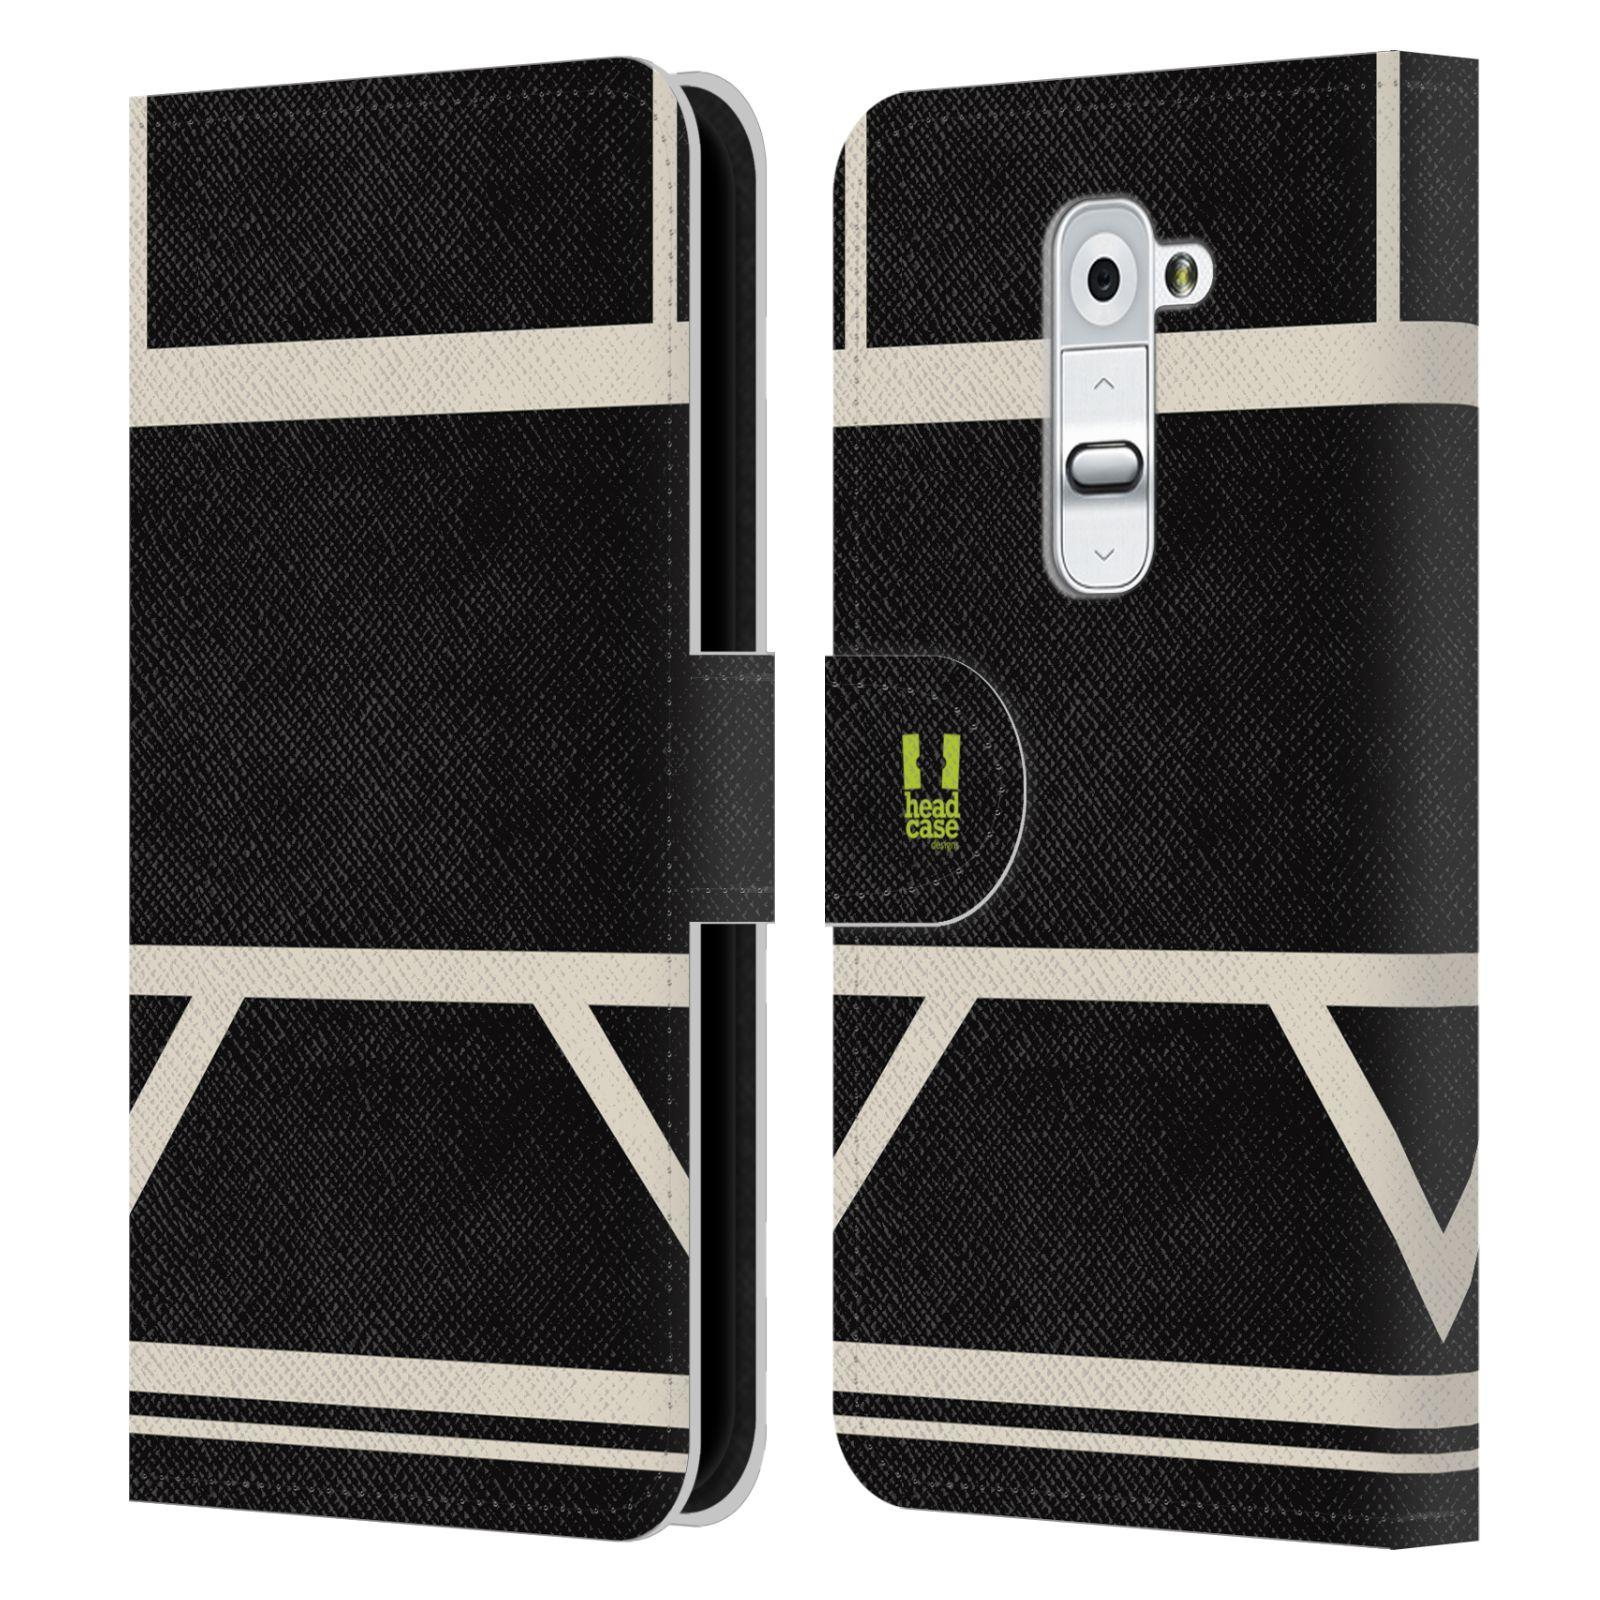 HEAD CASE Flipové pouzdro pro mobil LG G2 barevné tvary černá a bílá proužek